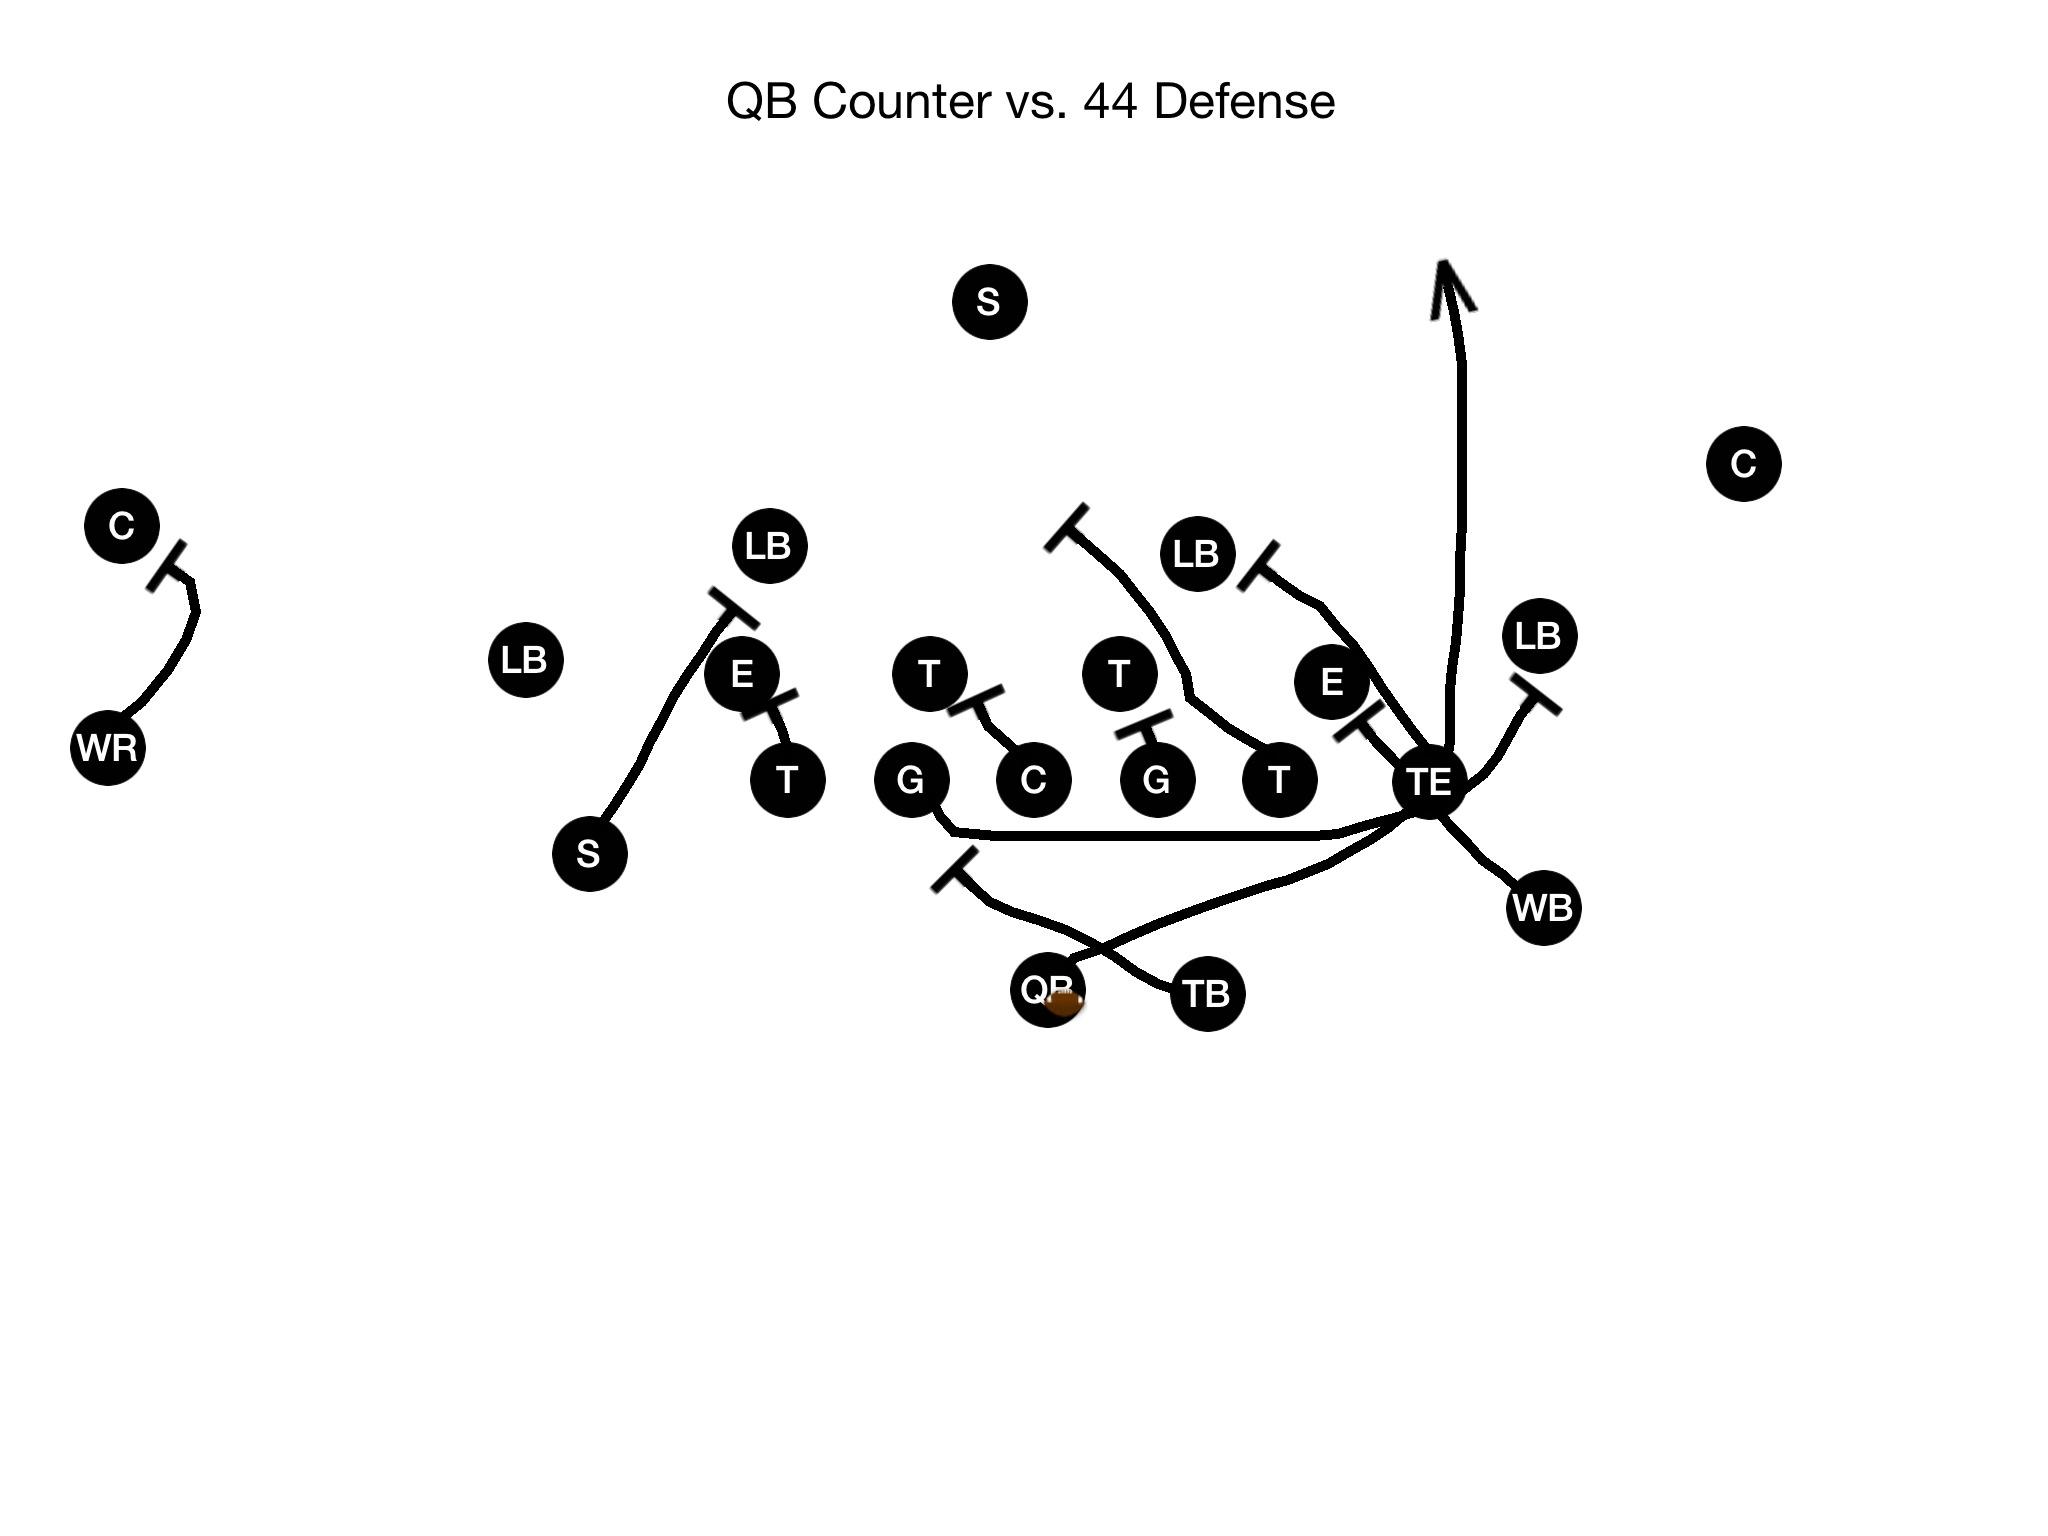 Quarterback Running Plays Qb Counter